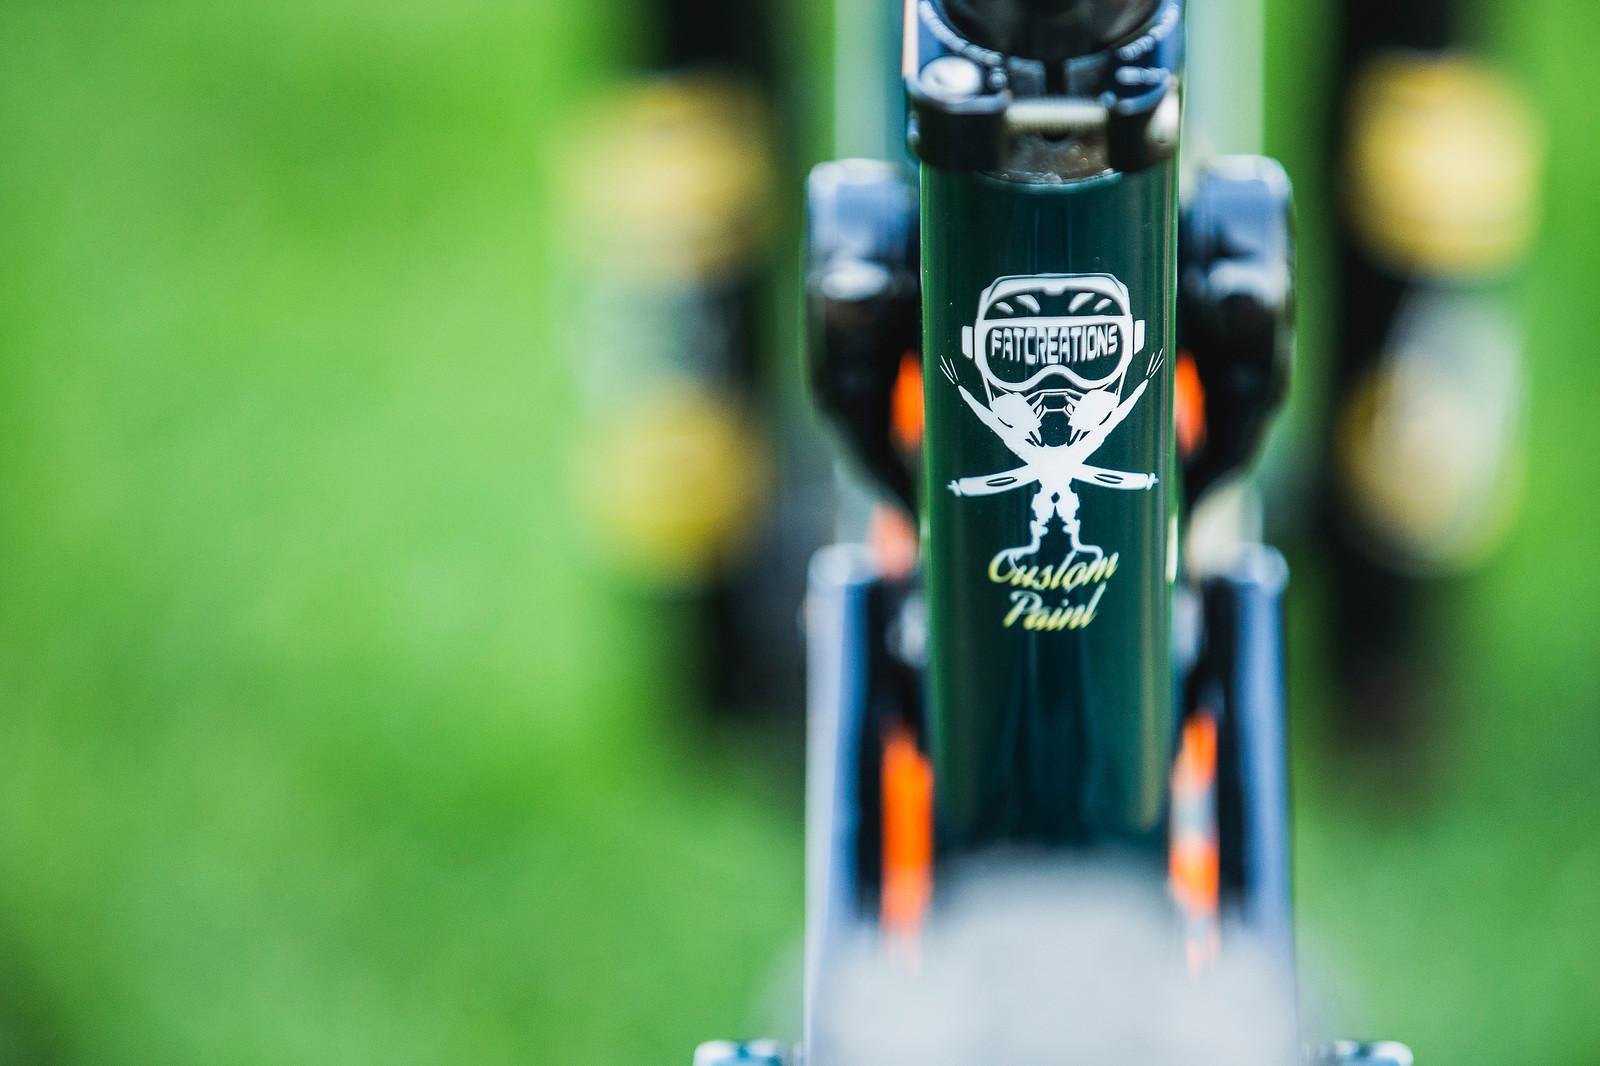 Matt Walker's Saracen Myst at 2019 Worlds MSA - Matt Walker's Saracen Myst at 2019 Worlds MSA - Mountain Biking Pictures - Vital MTB